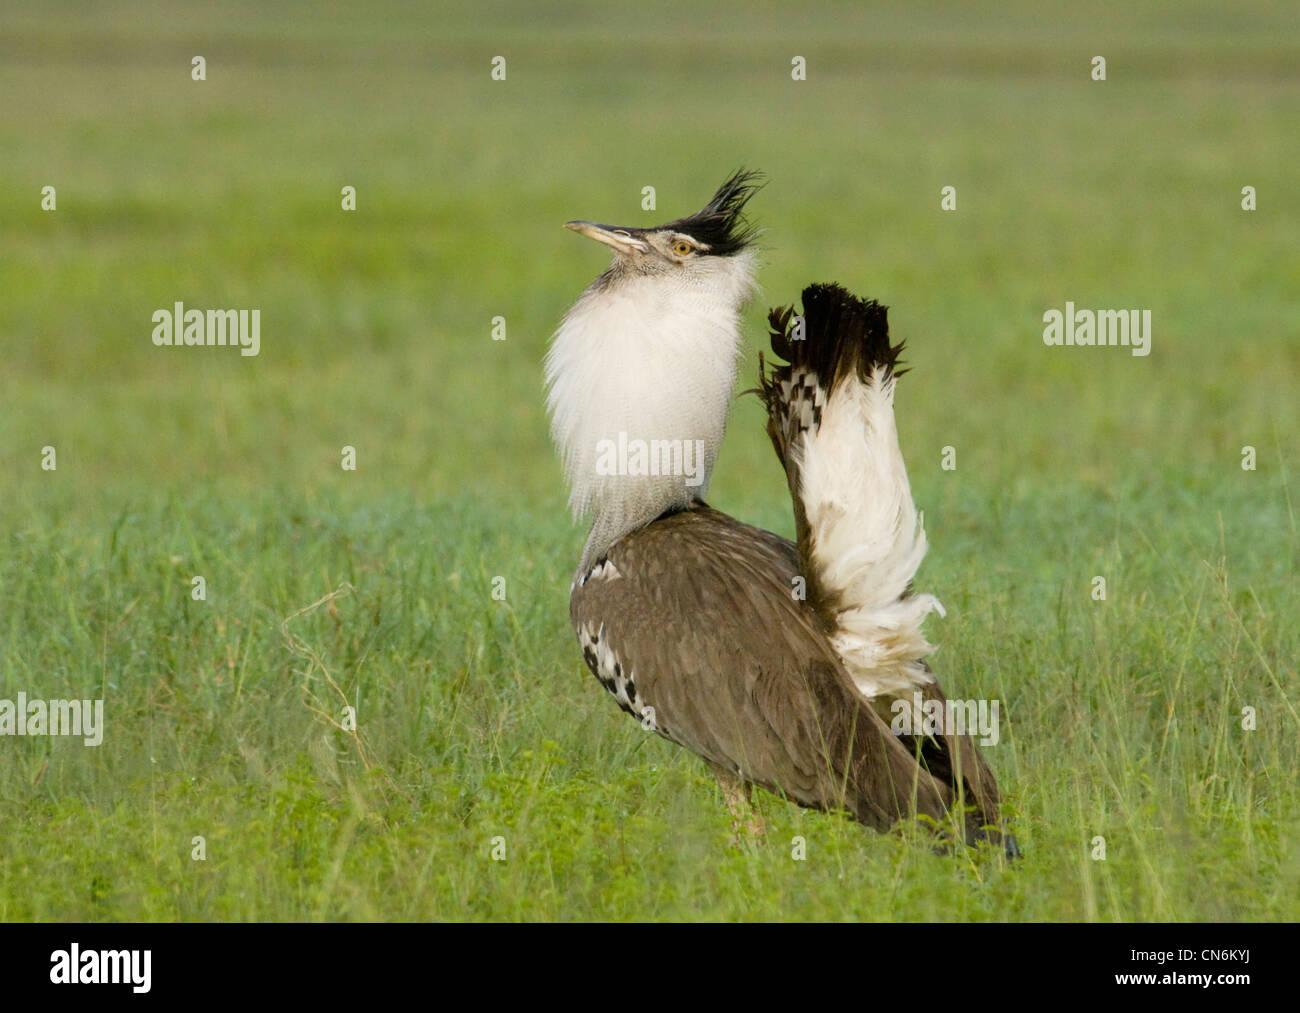 Kori bustard in courtship display Stock Photo